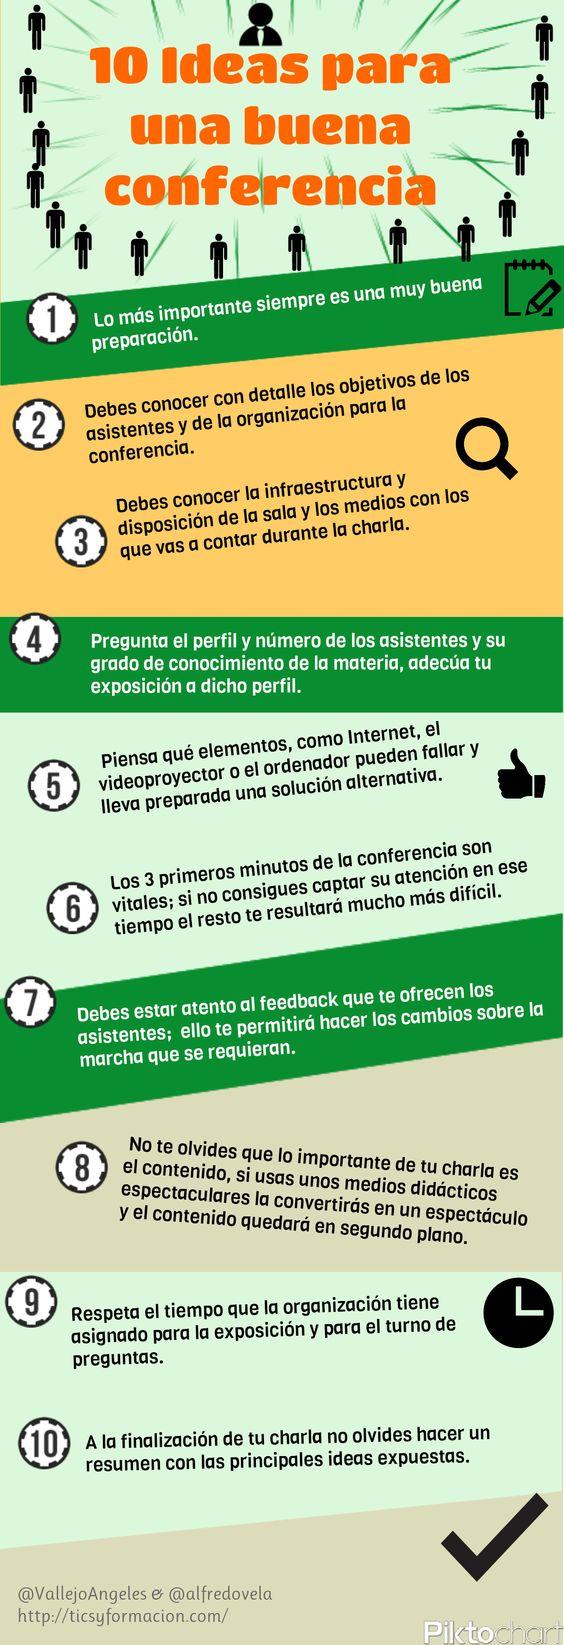 10 ideas para una buena conferencia #infografia #infographic #education